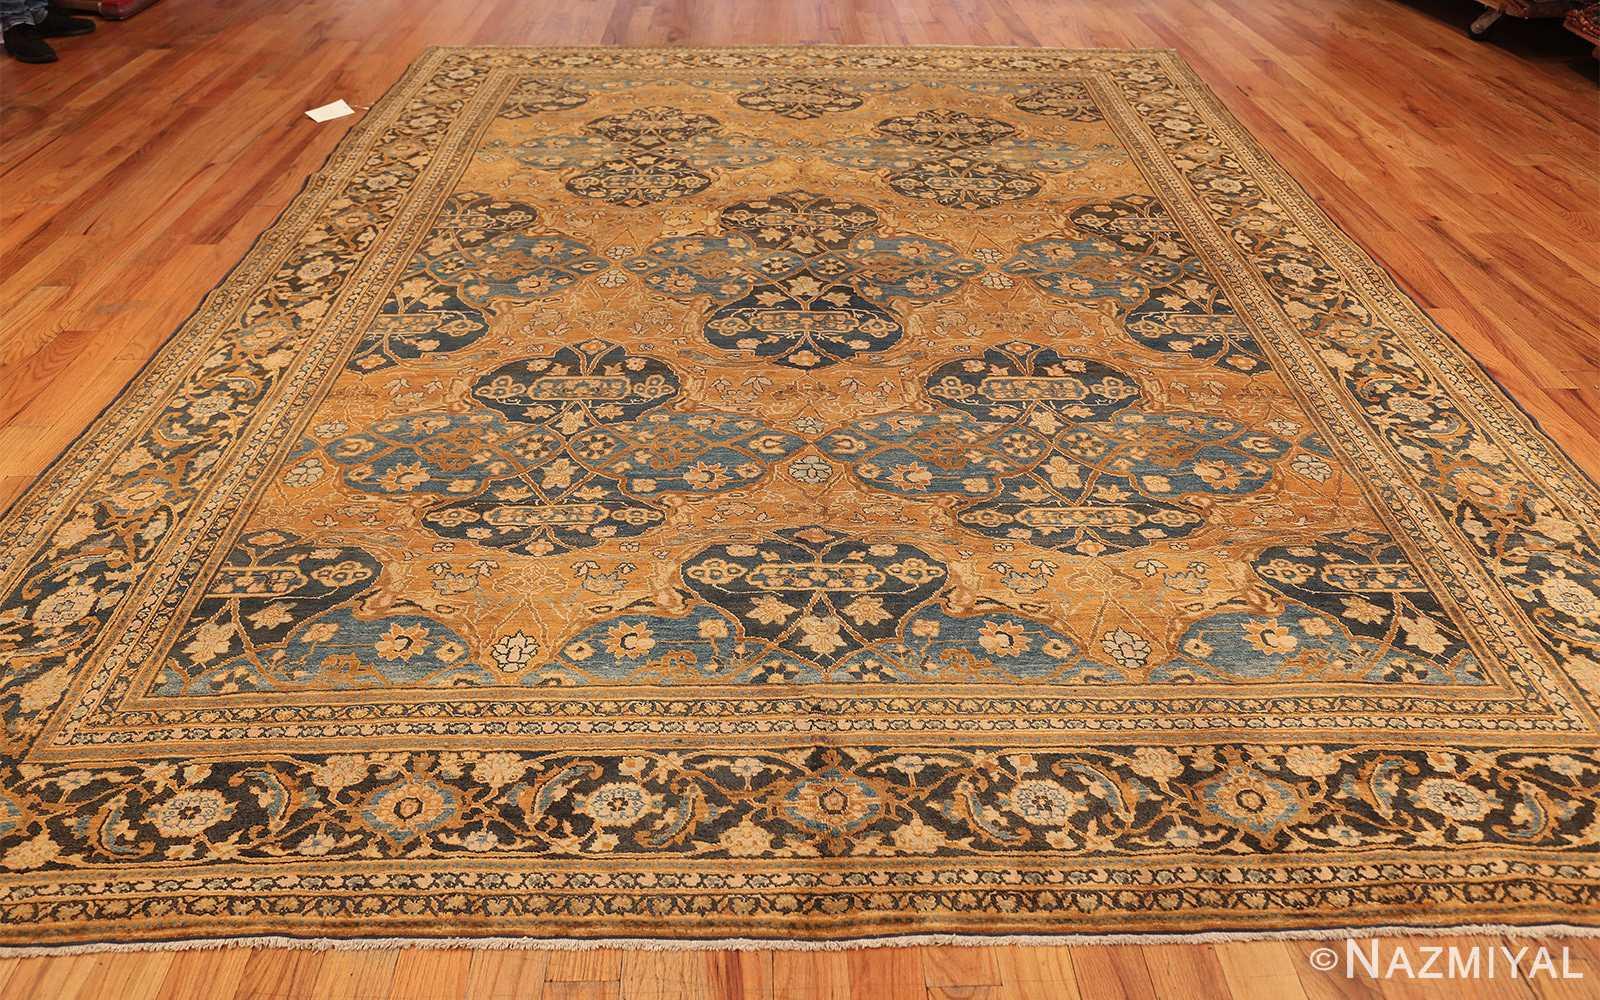 antique brown color persian khorassan rug 49708 whole Nazmiyal